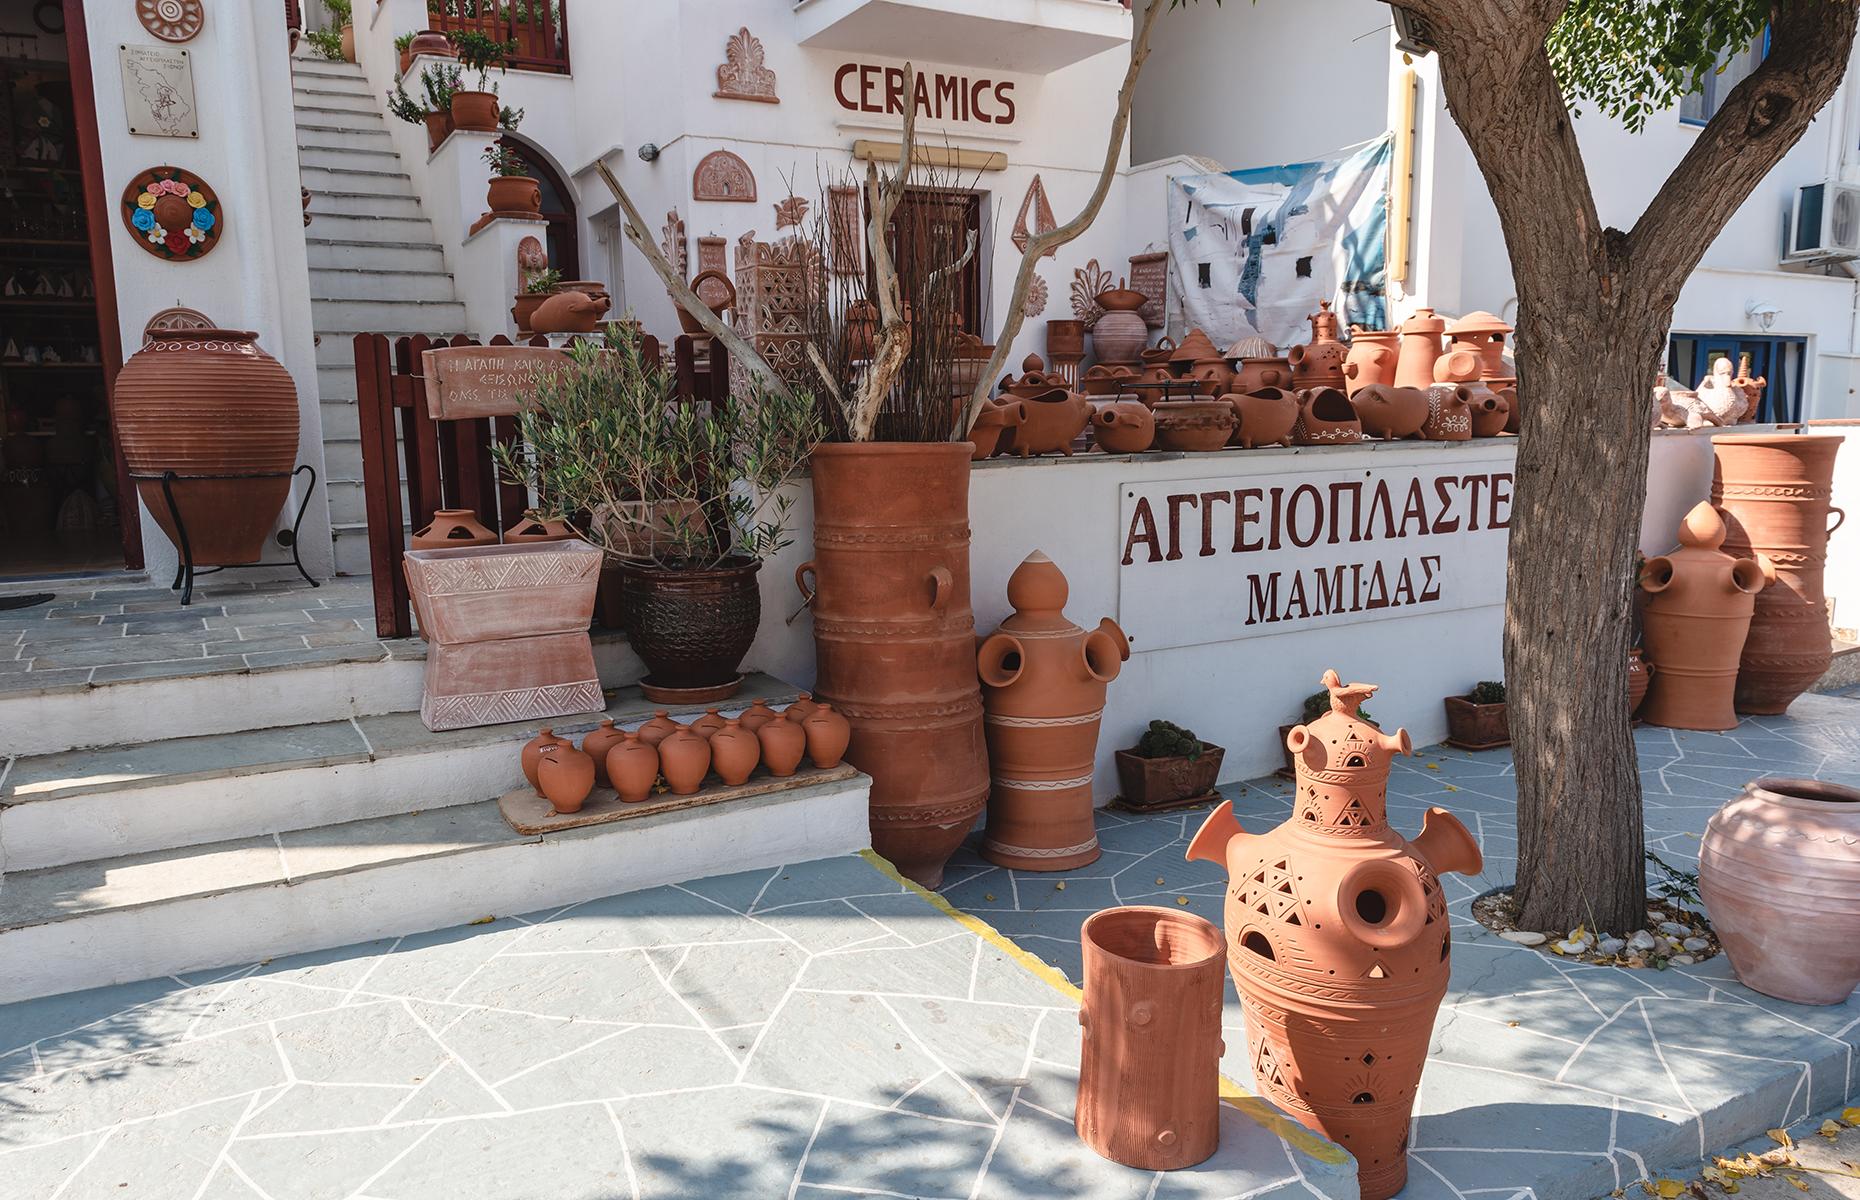 Pottery shop on Sifnos (Image: vivooo/Shutterstock)